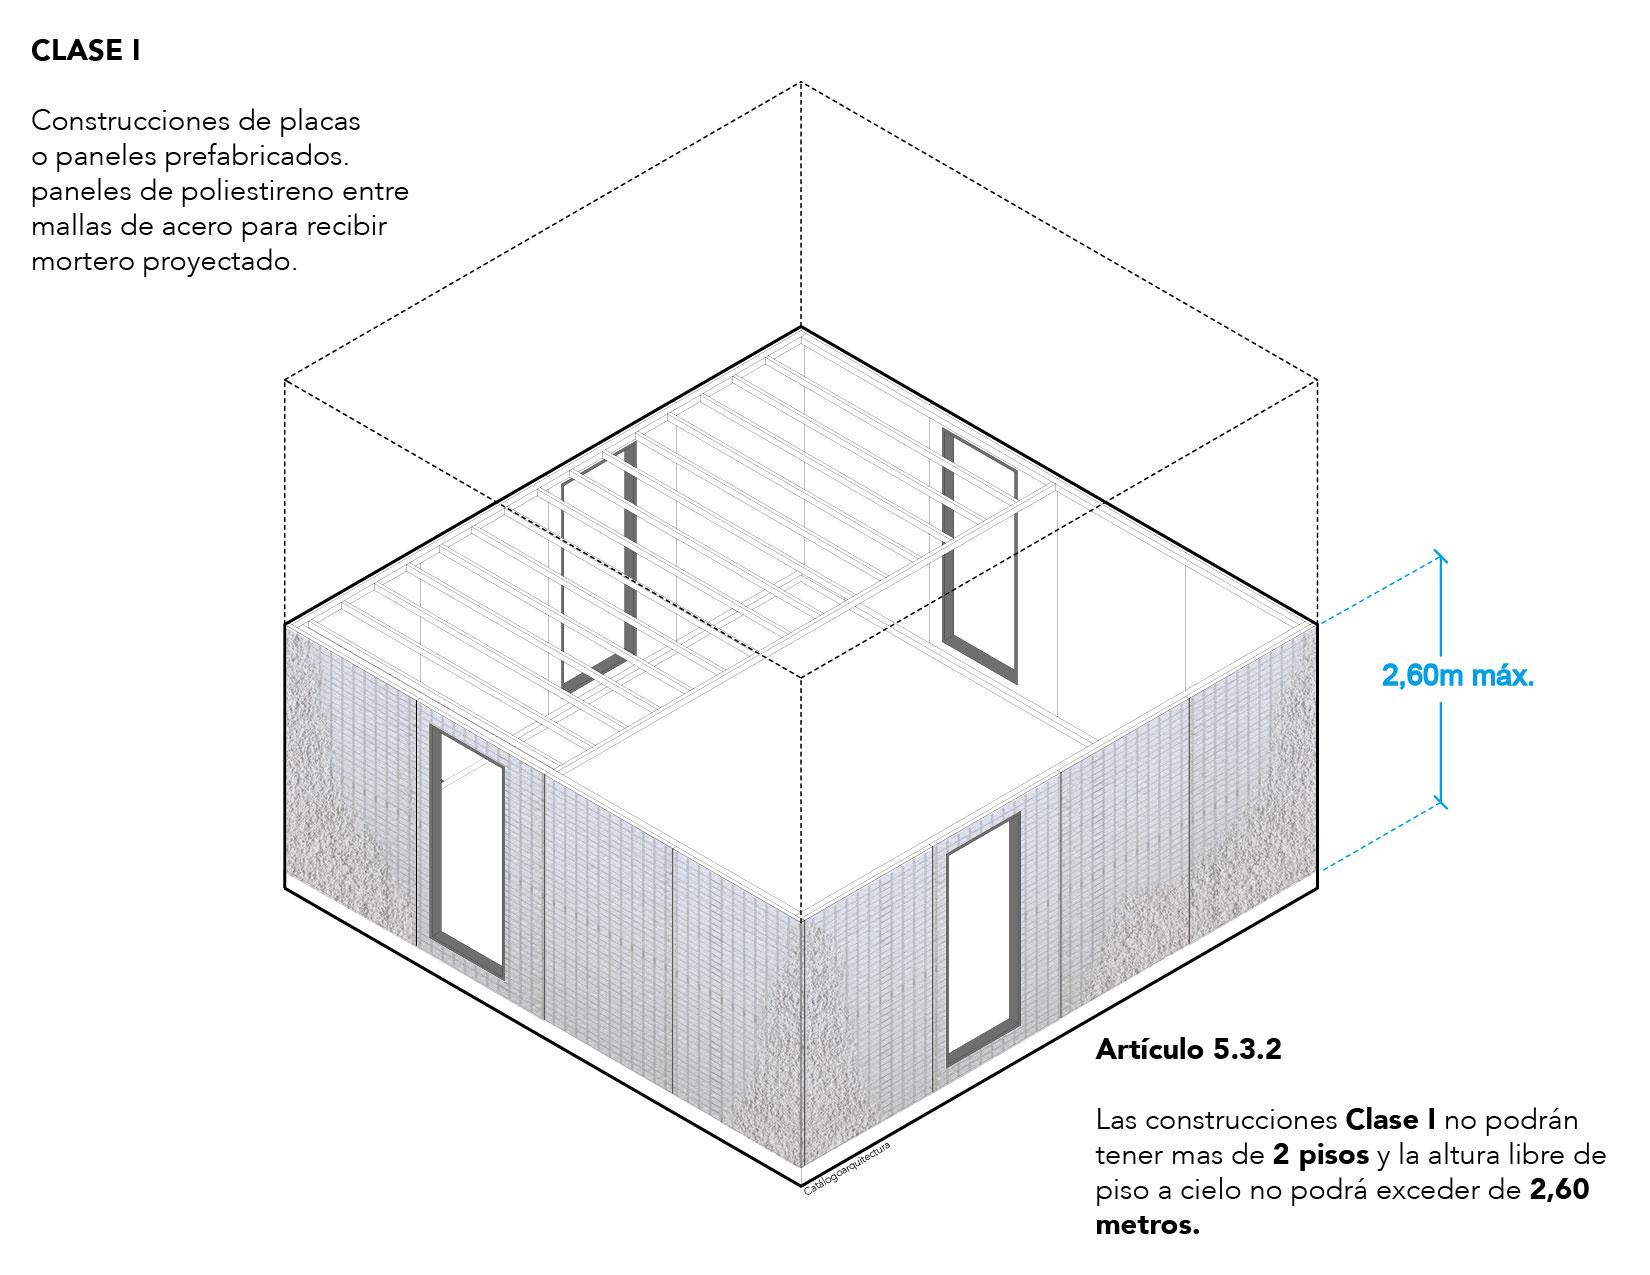 Altura construcción en paneles o placas, clase i, OGUC, Chile.